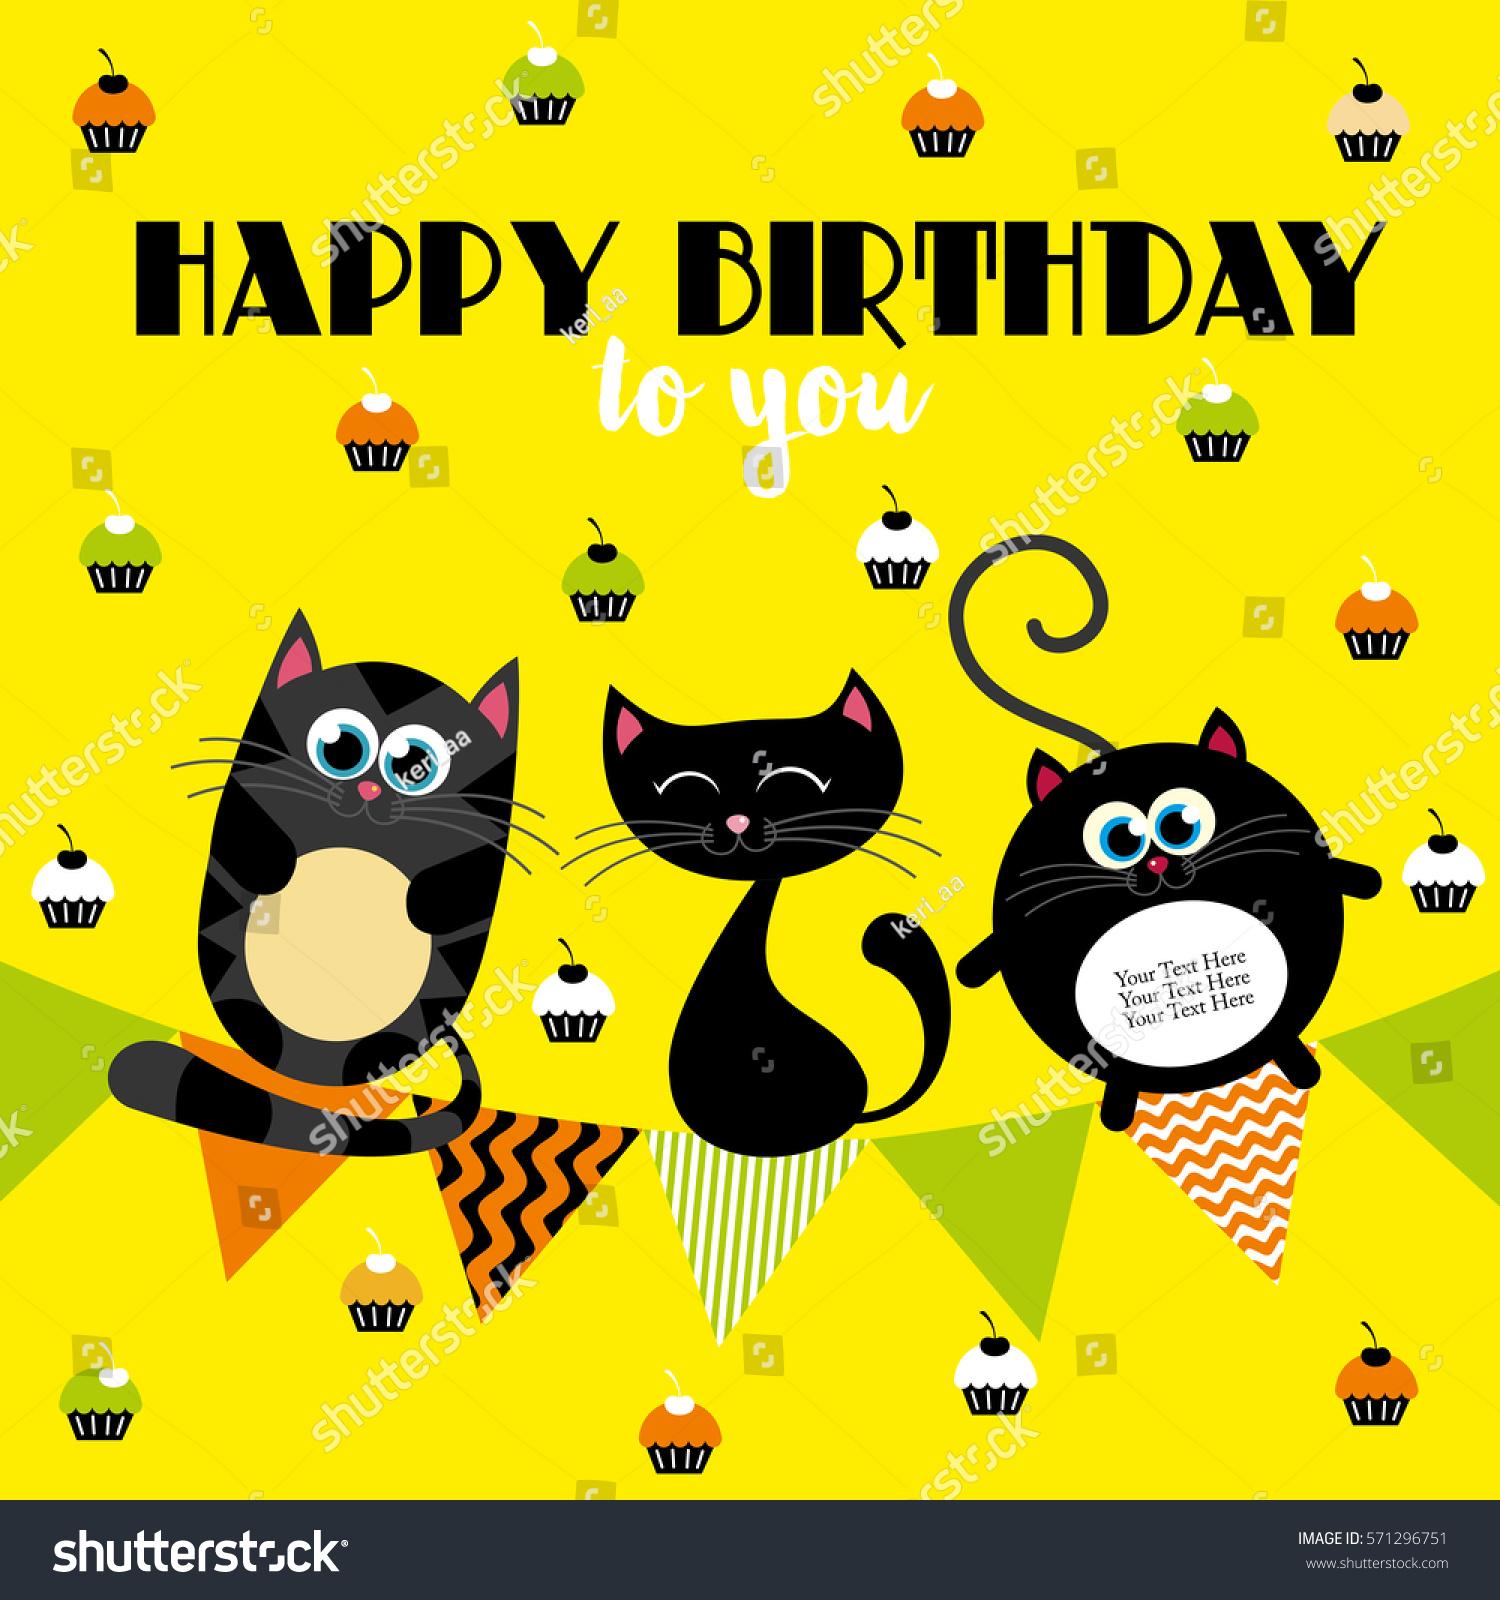 Cute Creative Cards Templates Happy Birthday Stock Photo Photo